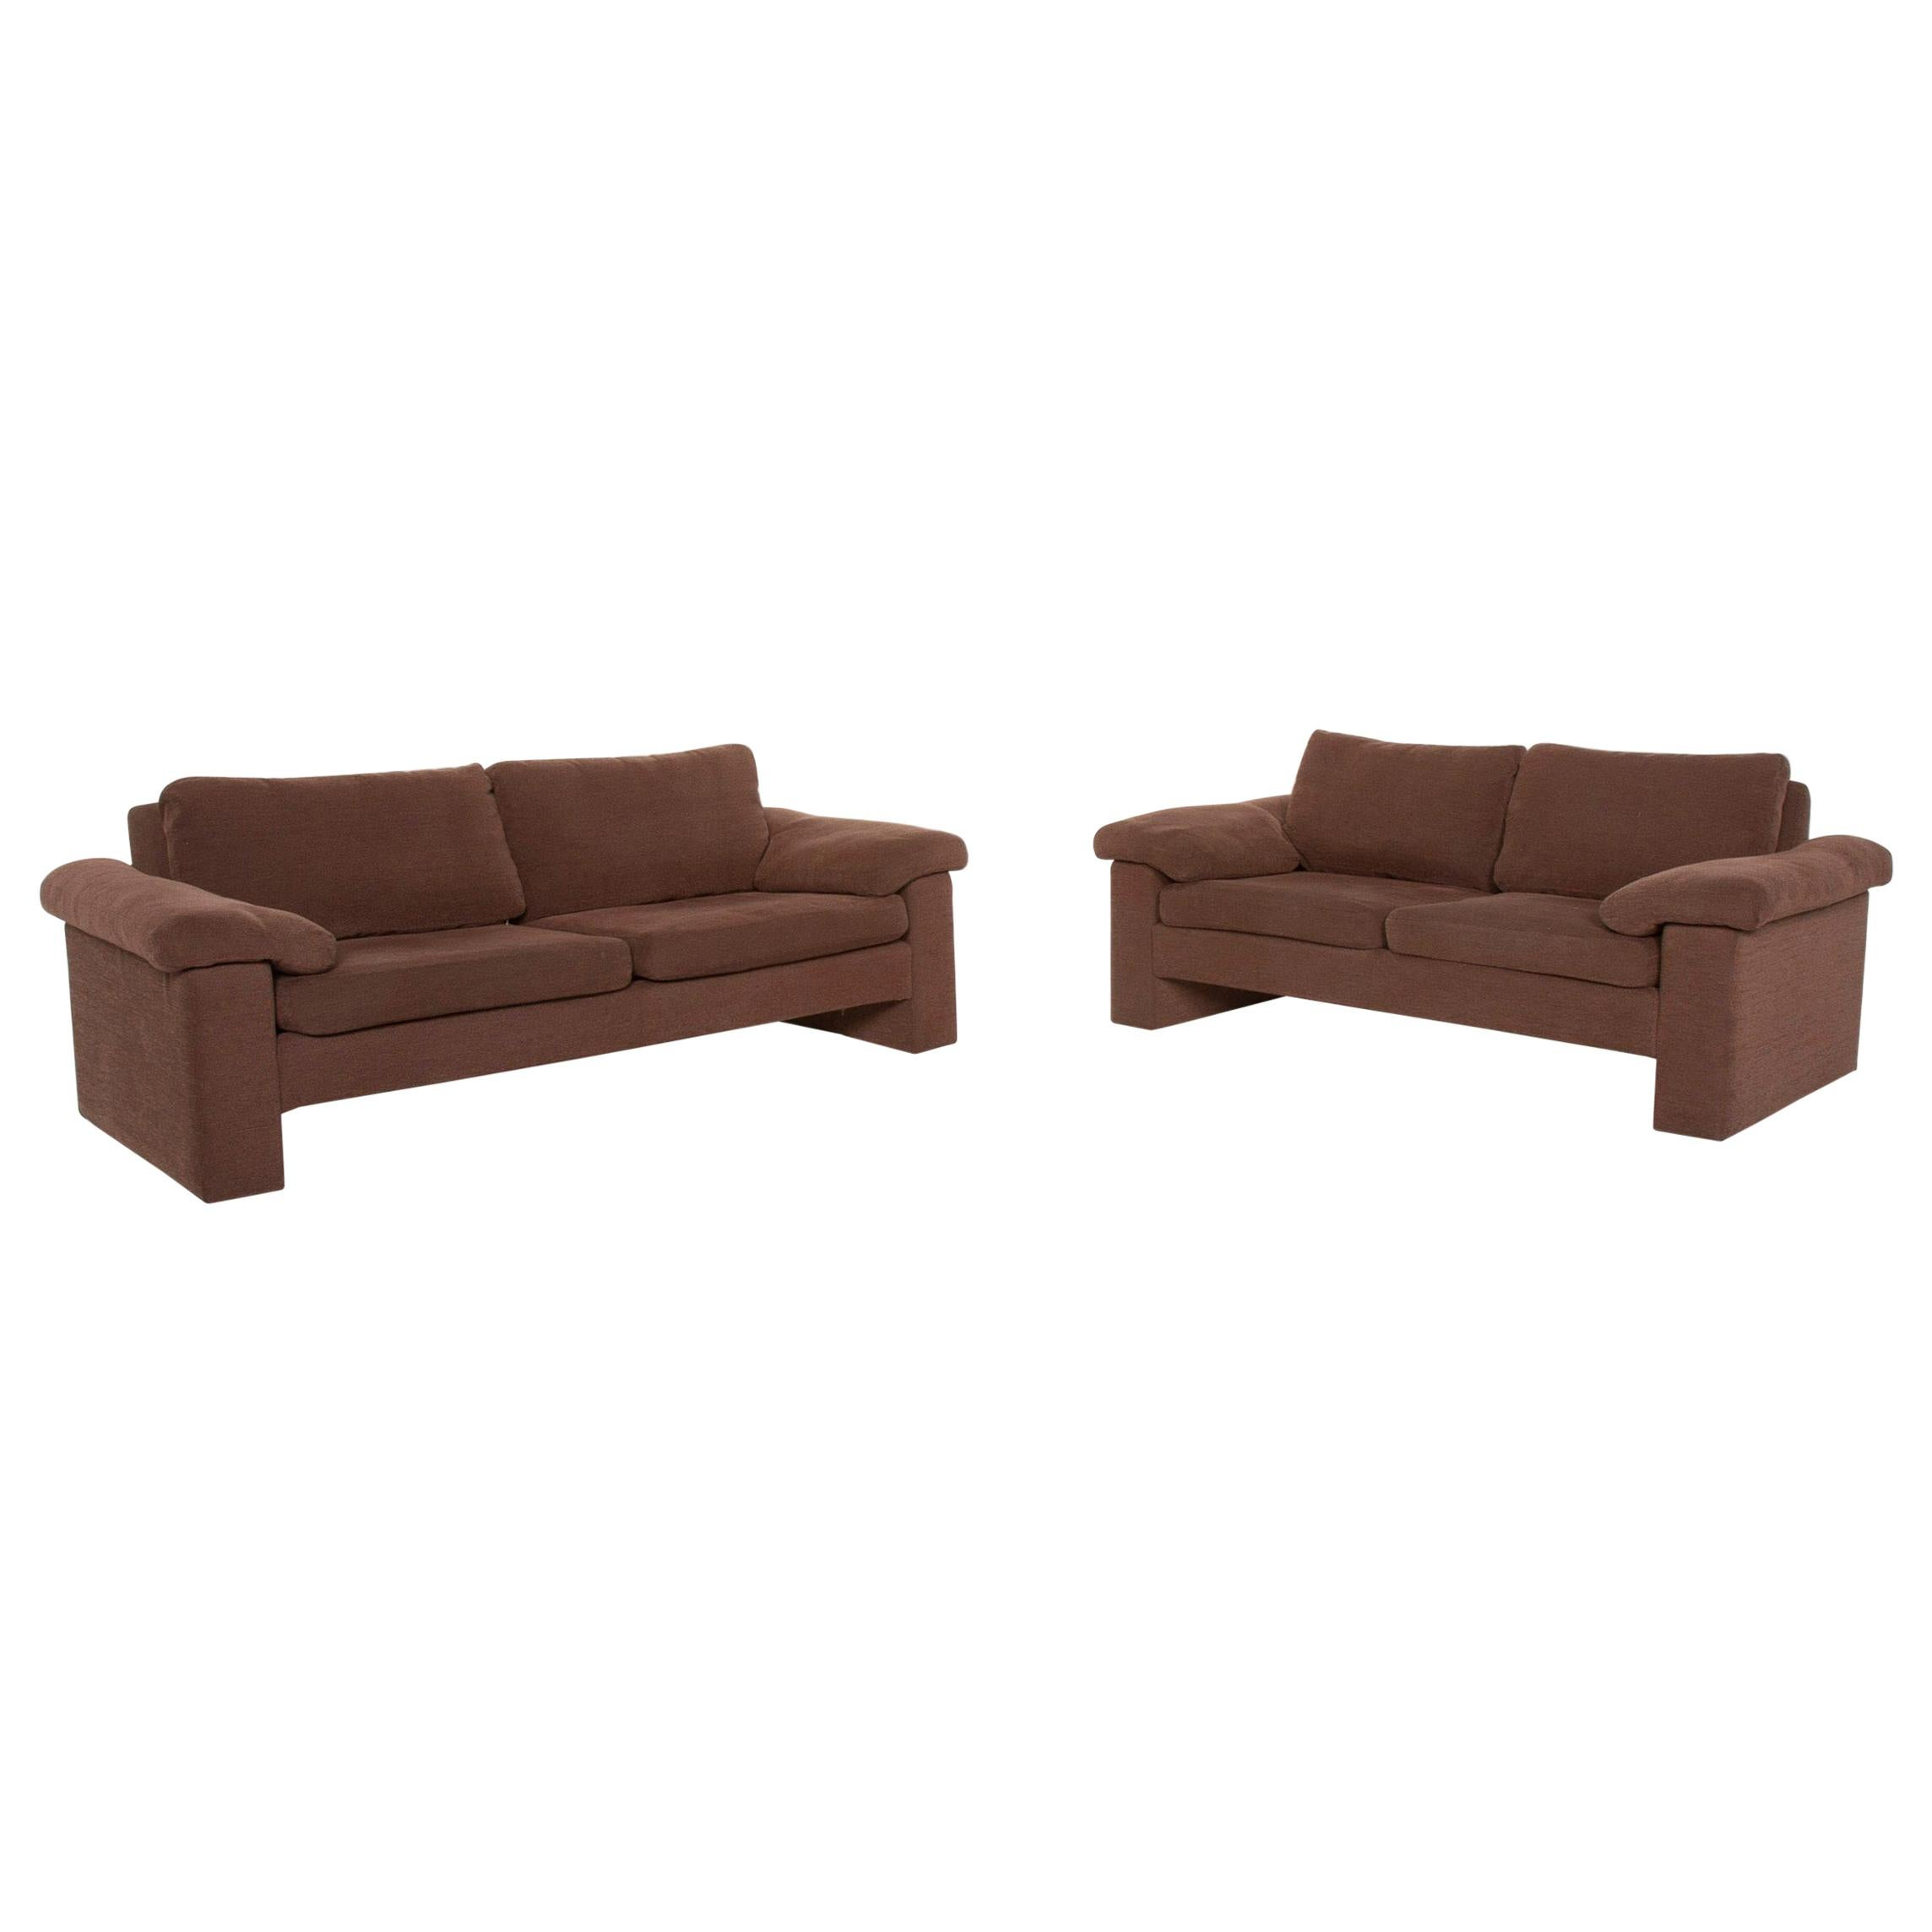 COR Conseta Fabric Sofa Set Brown Three-Seater Two-Seater